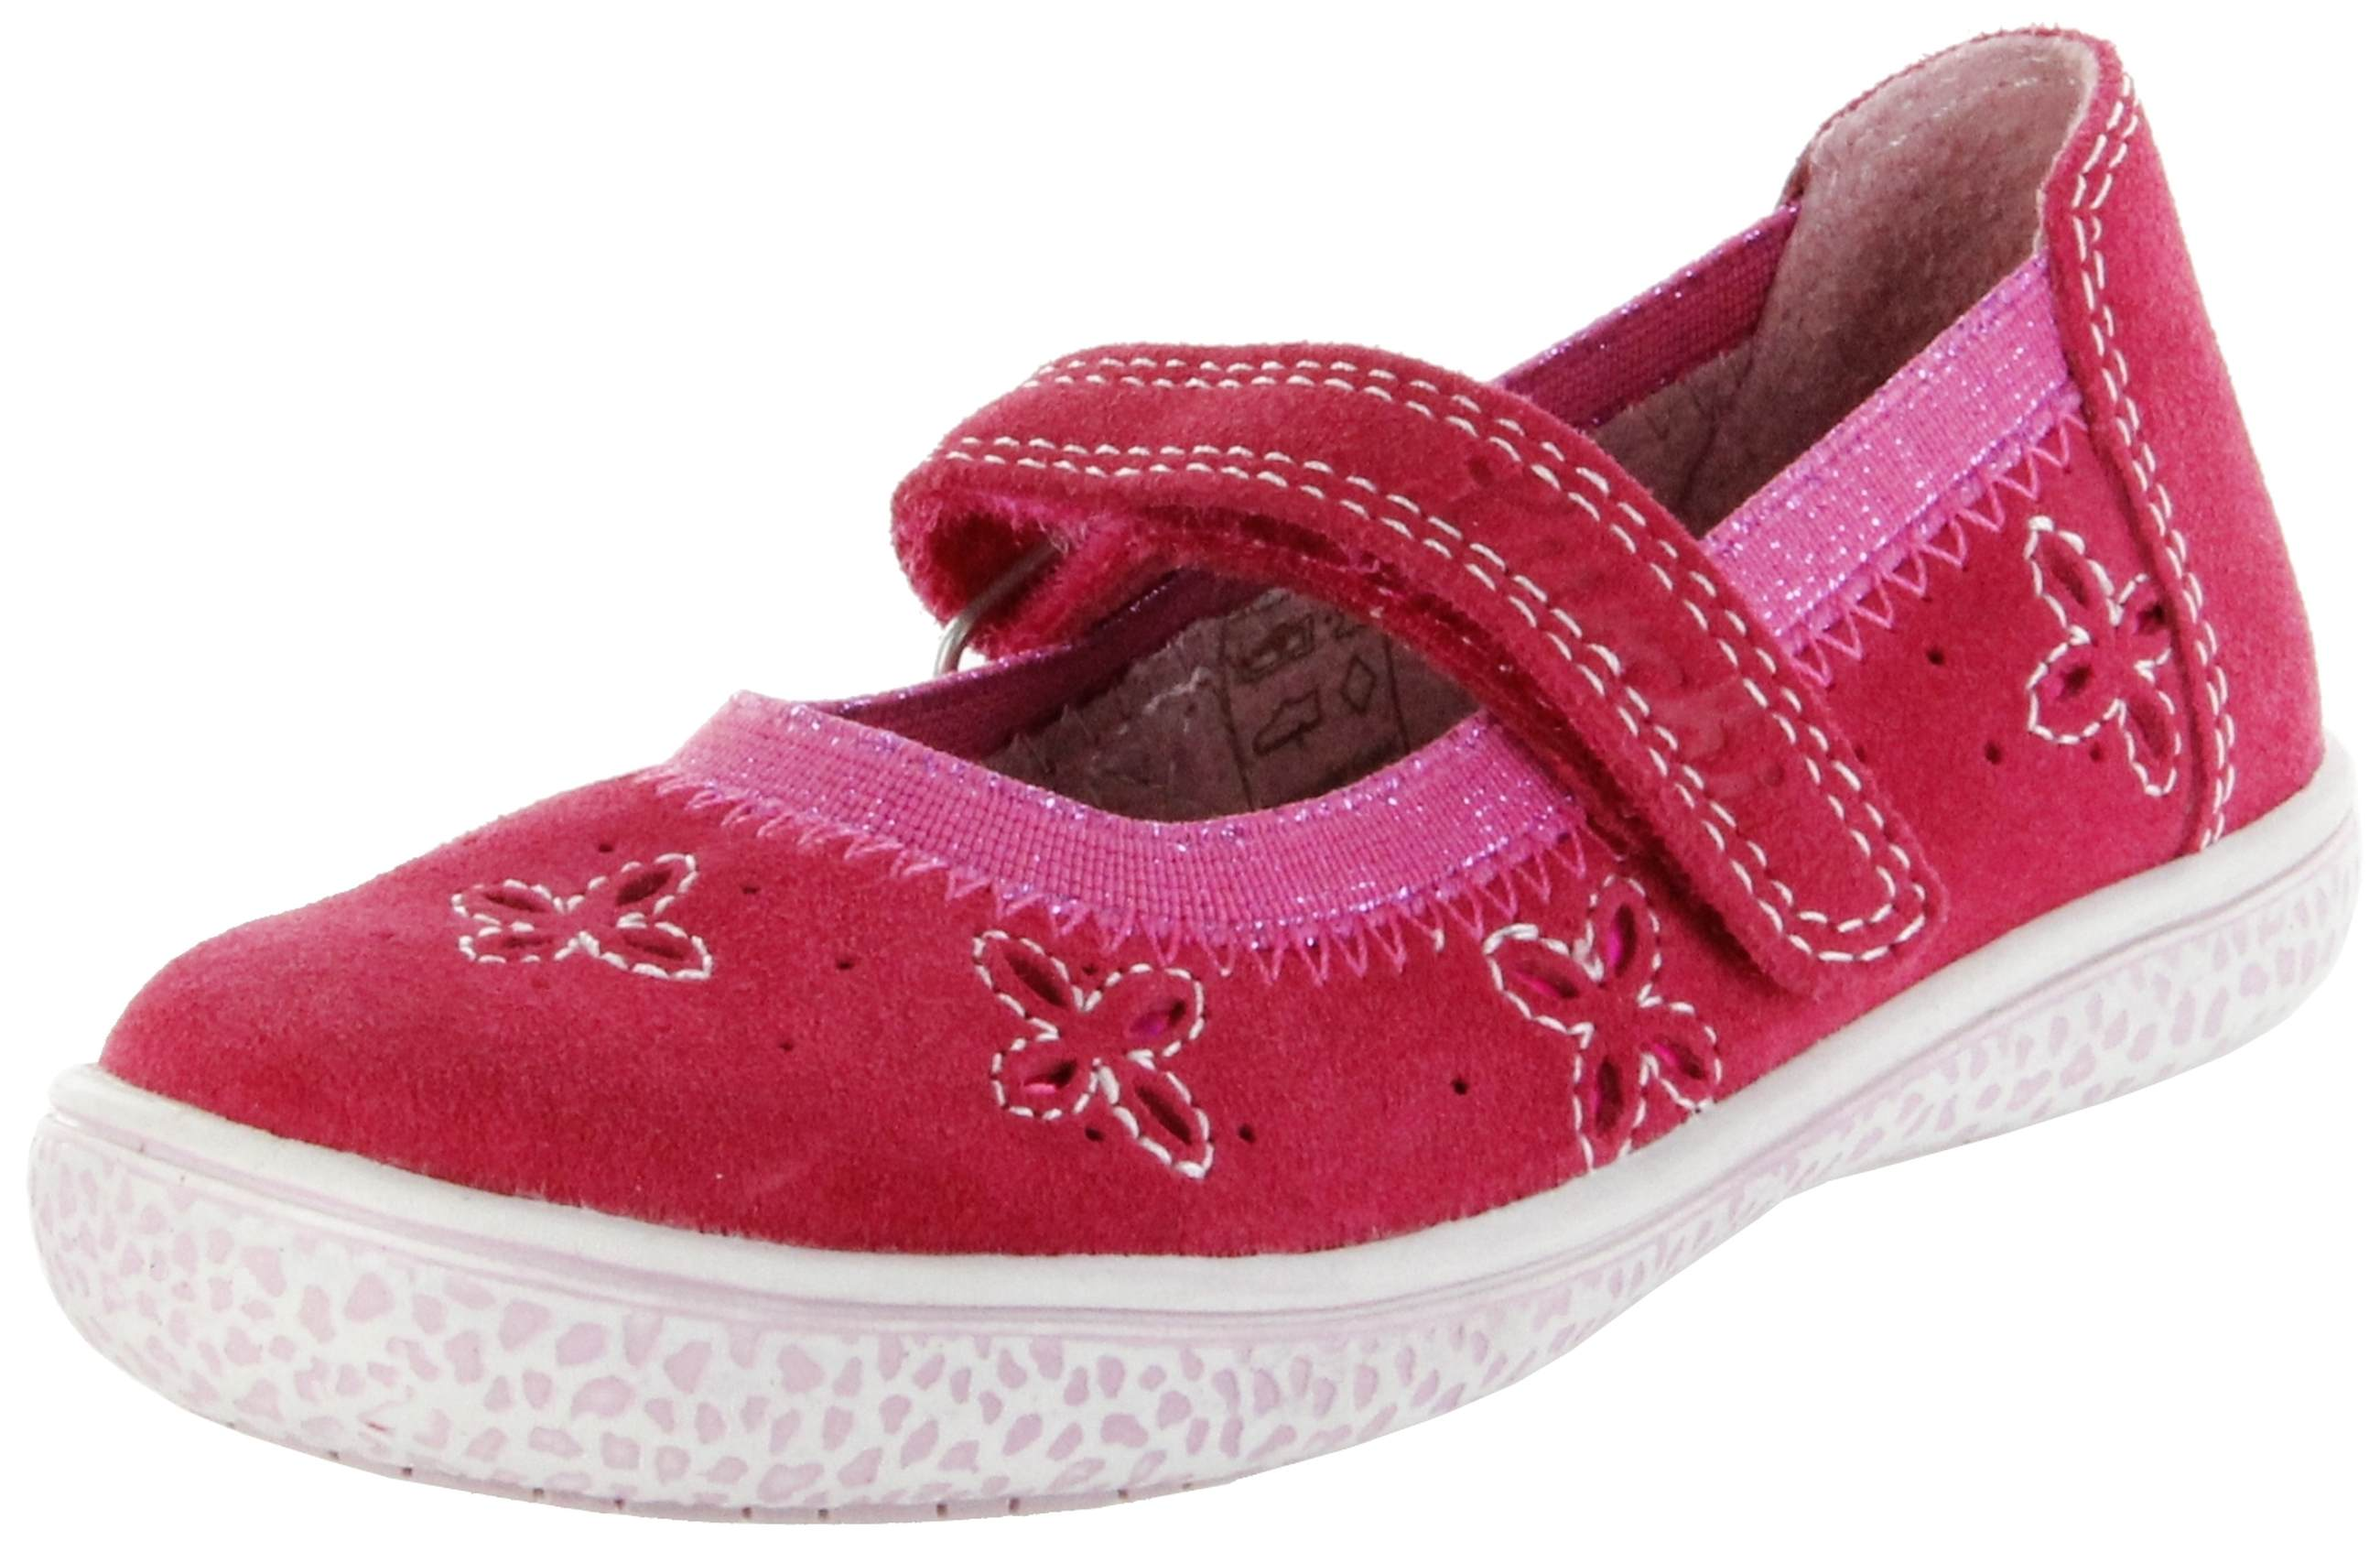 a7147da28c35cd Lurchi Kinder Ballerinas pink Velourleder Mädchen Schuhe 33-15270-43 Tiffi